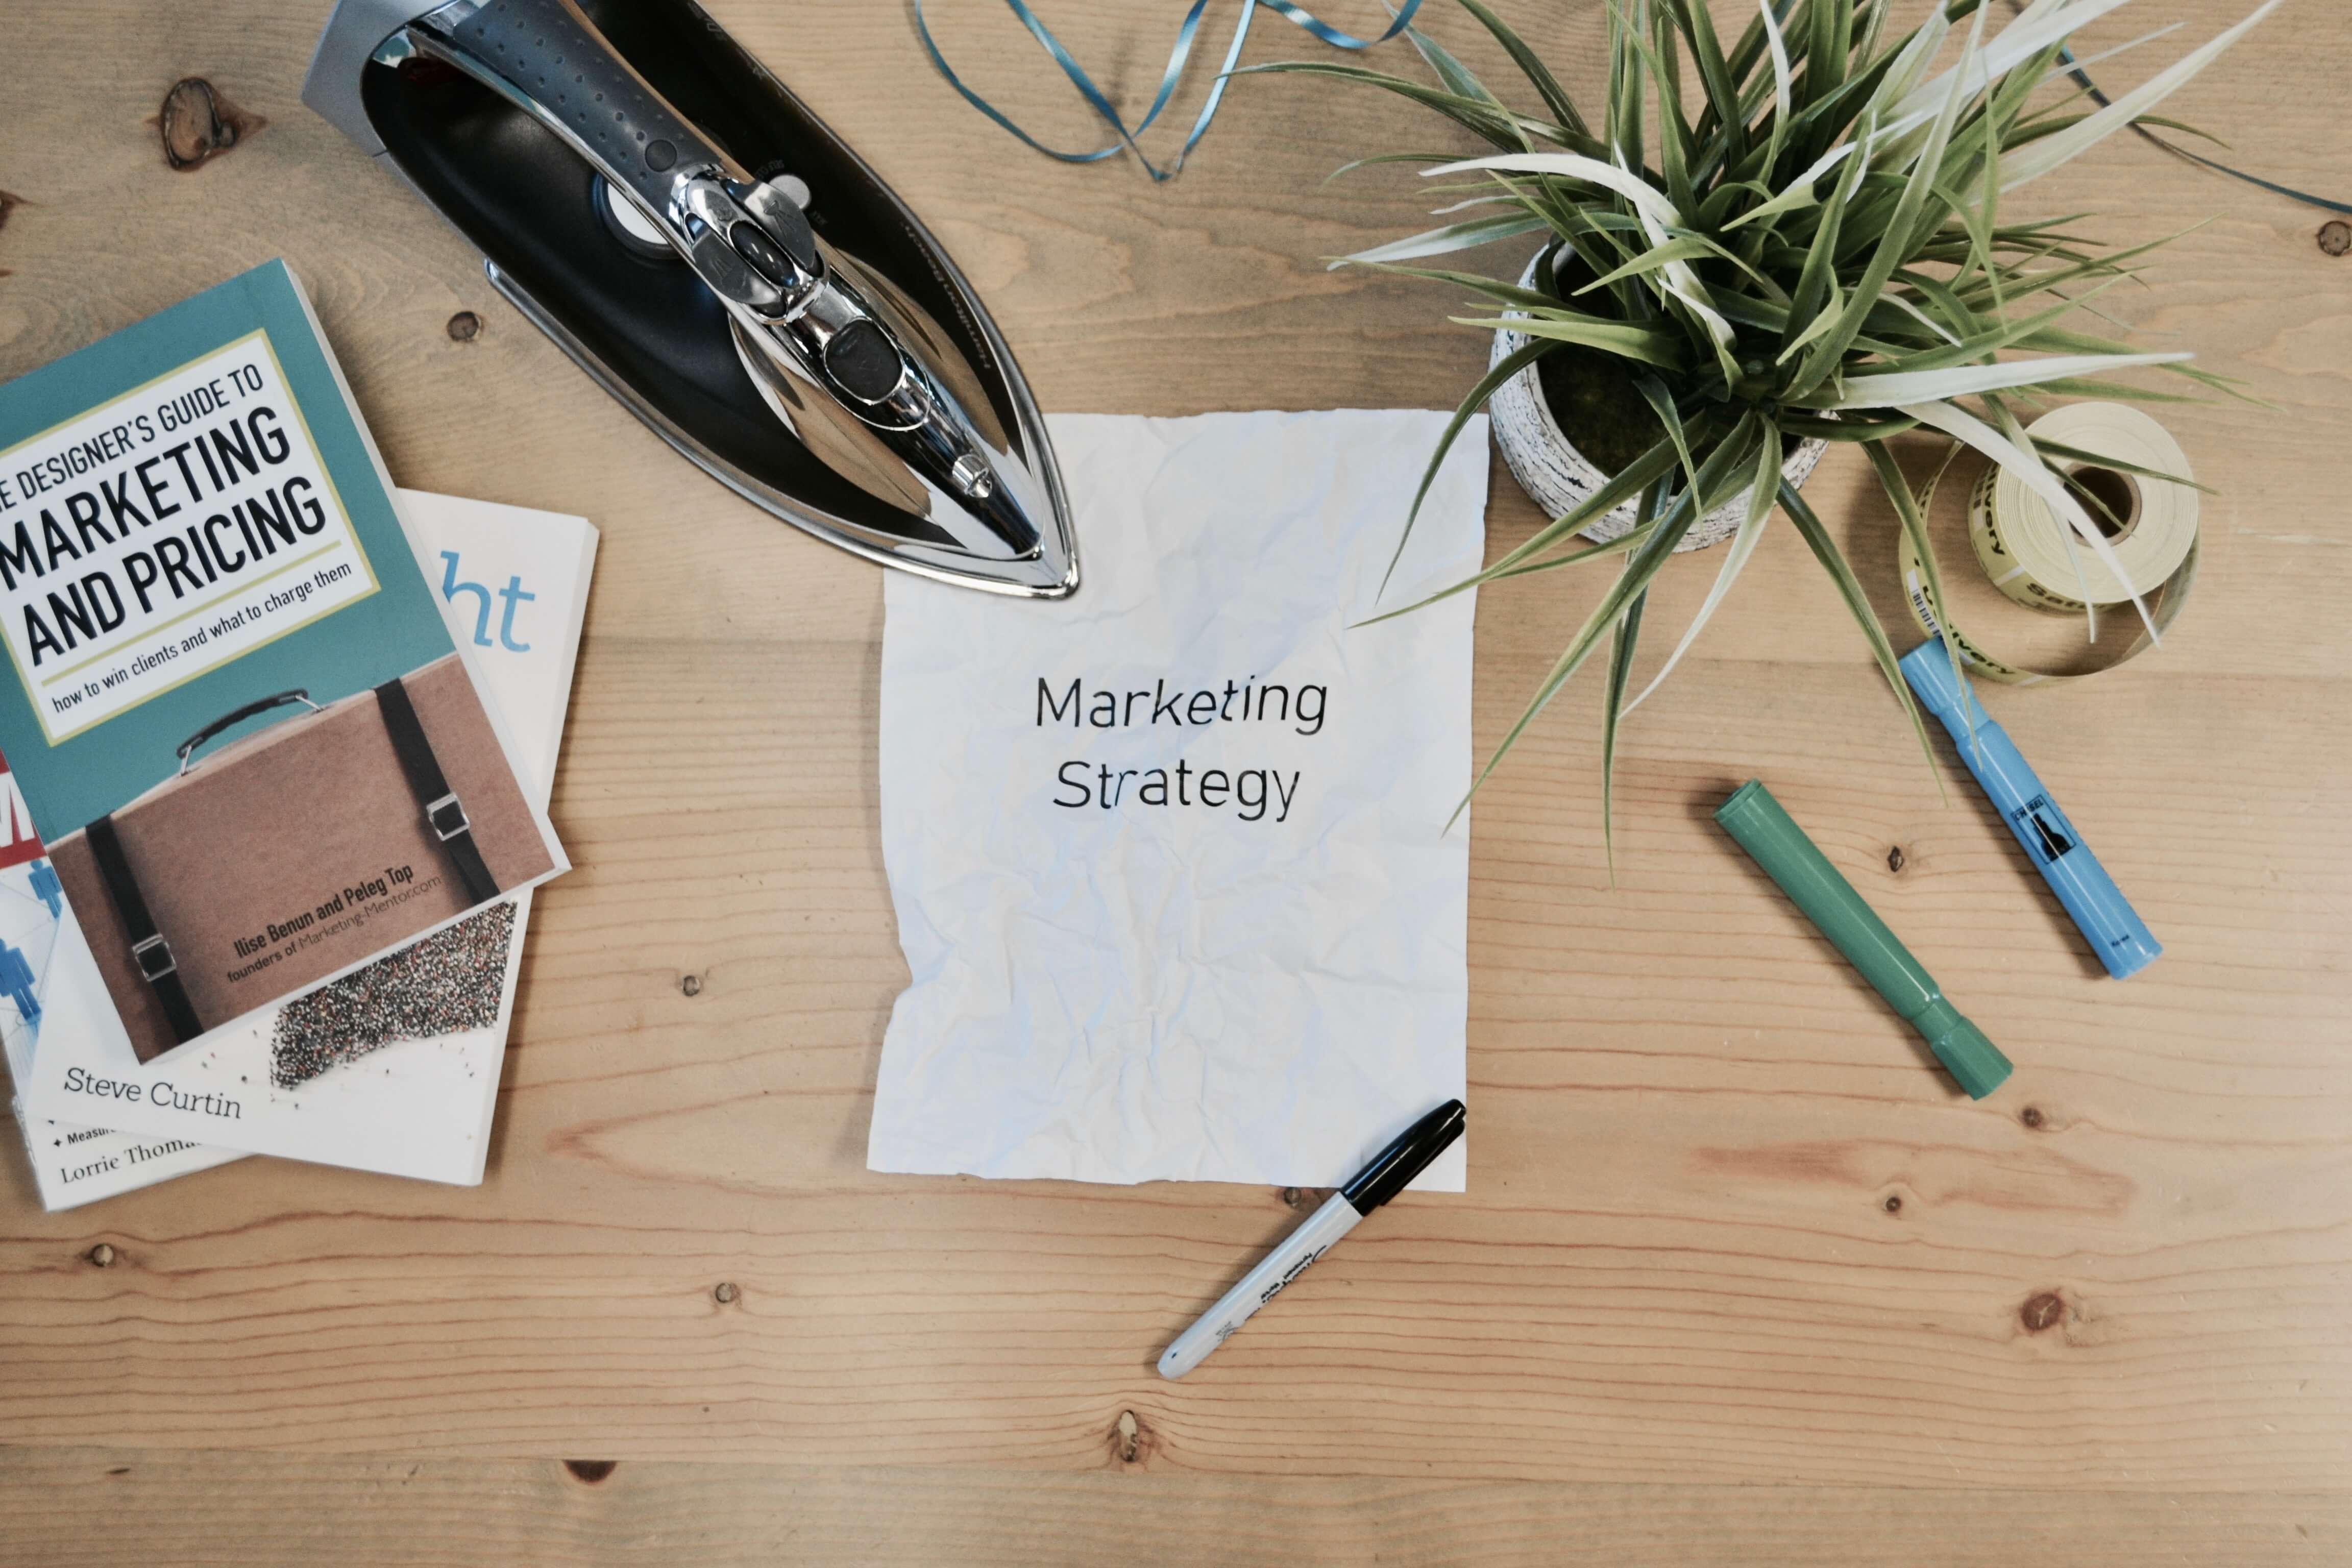 Marketing Strategy Sign Hi Interactive